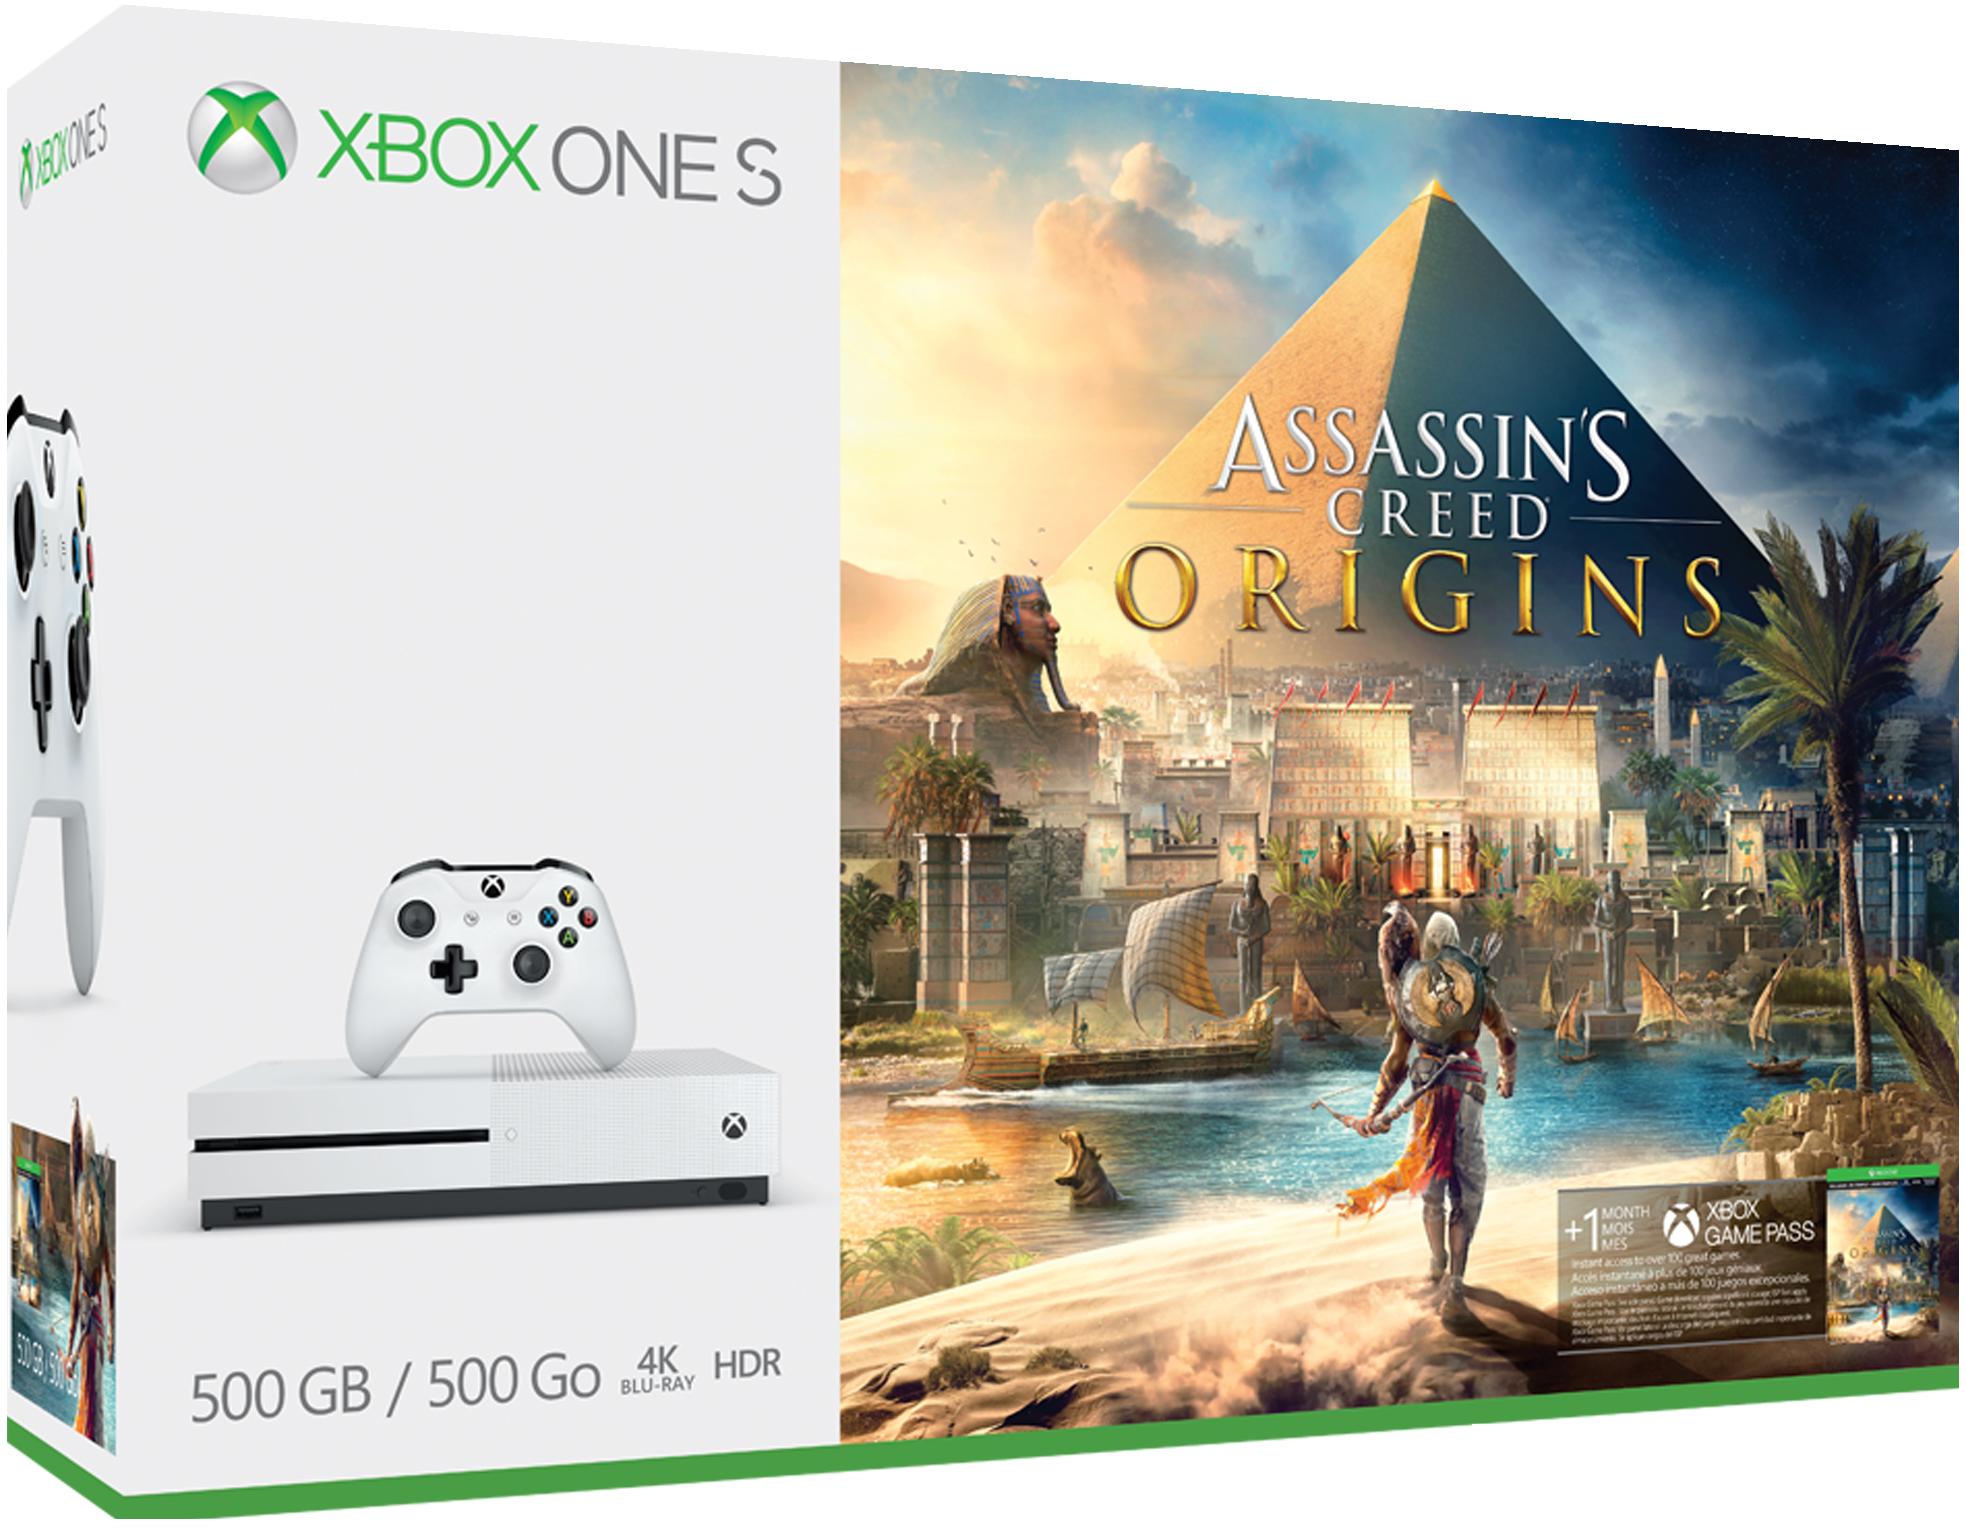 Xbox One S 500GB Console - Assassin's Creed Origins Bundle ZQ9-00225